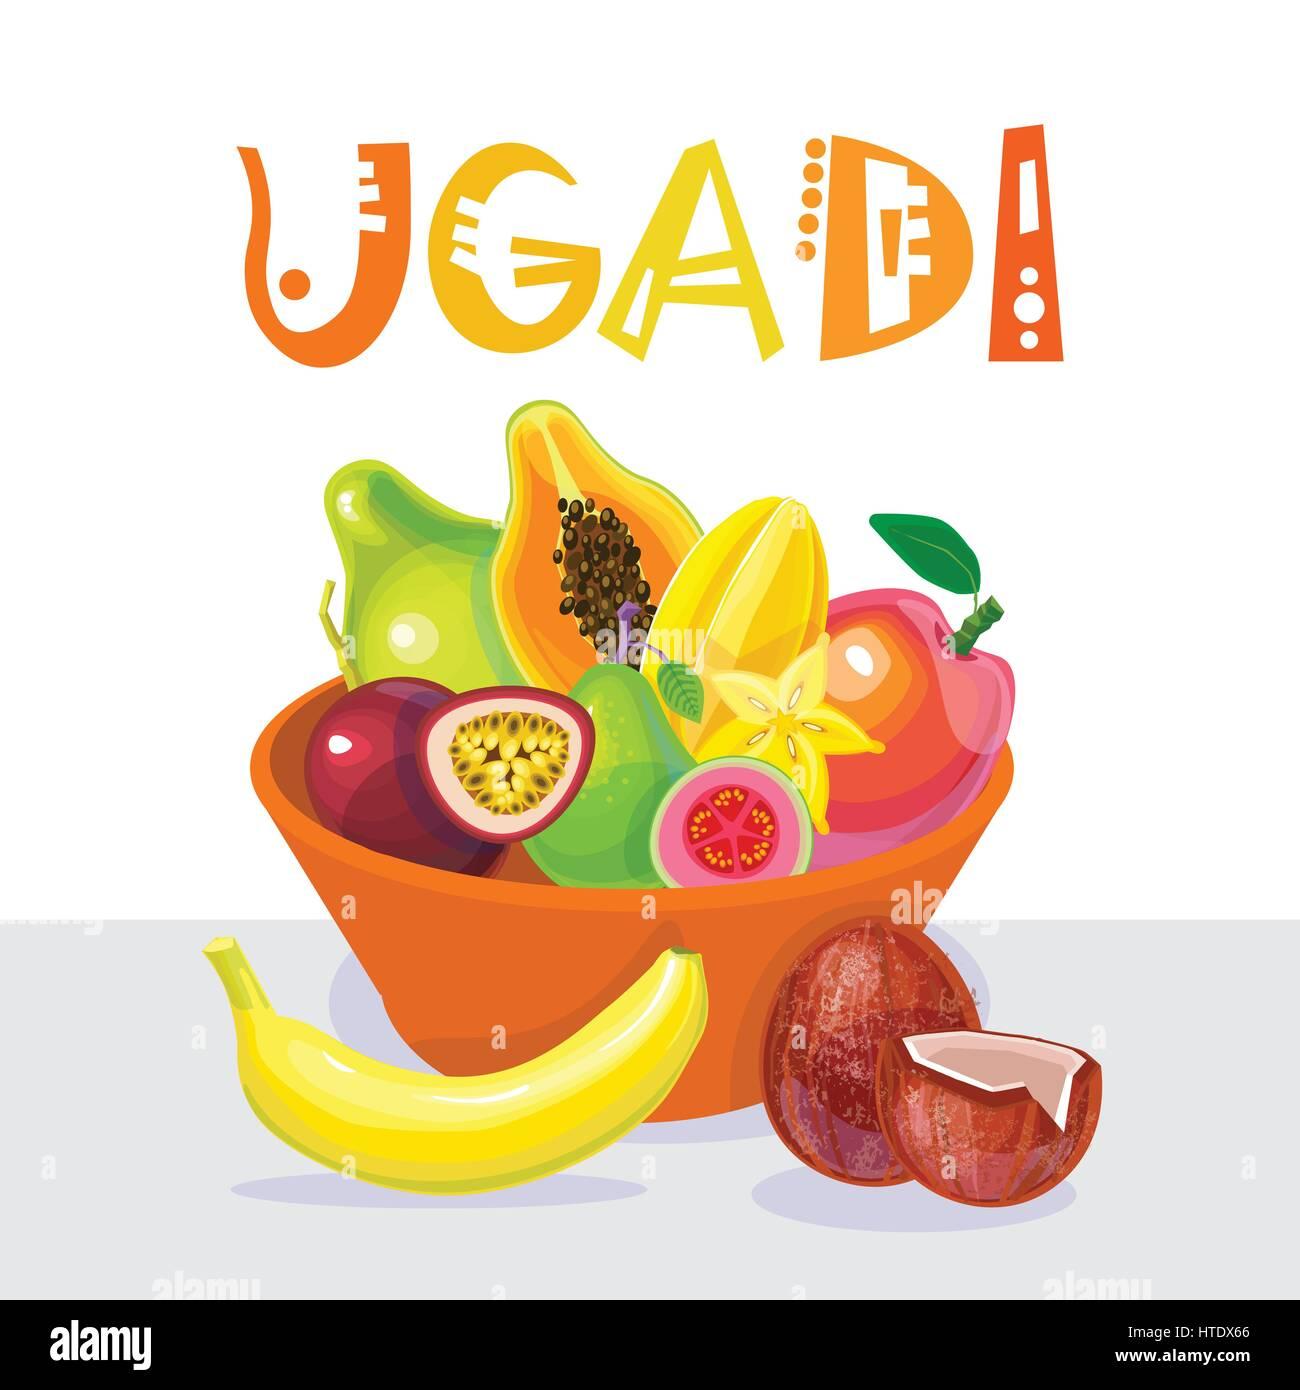 Happy Ugadi And Gudi Padwa Hindu New Year Greeting Card Holiday